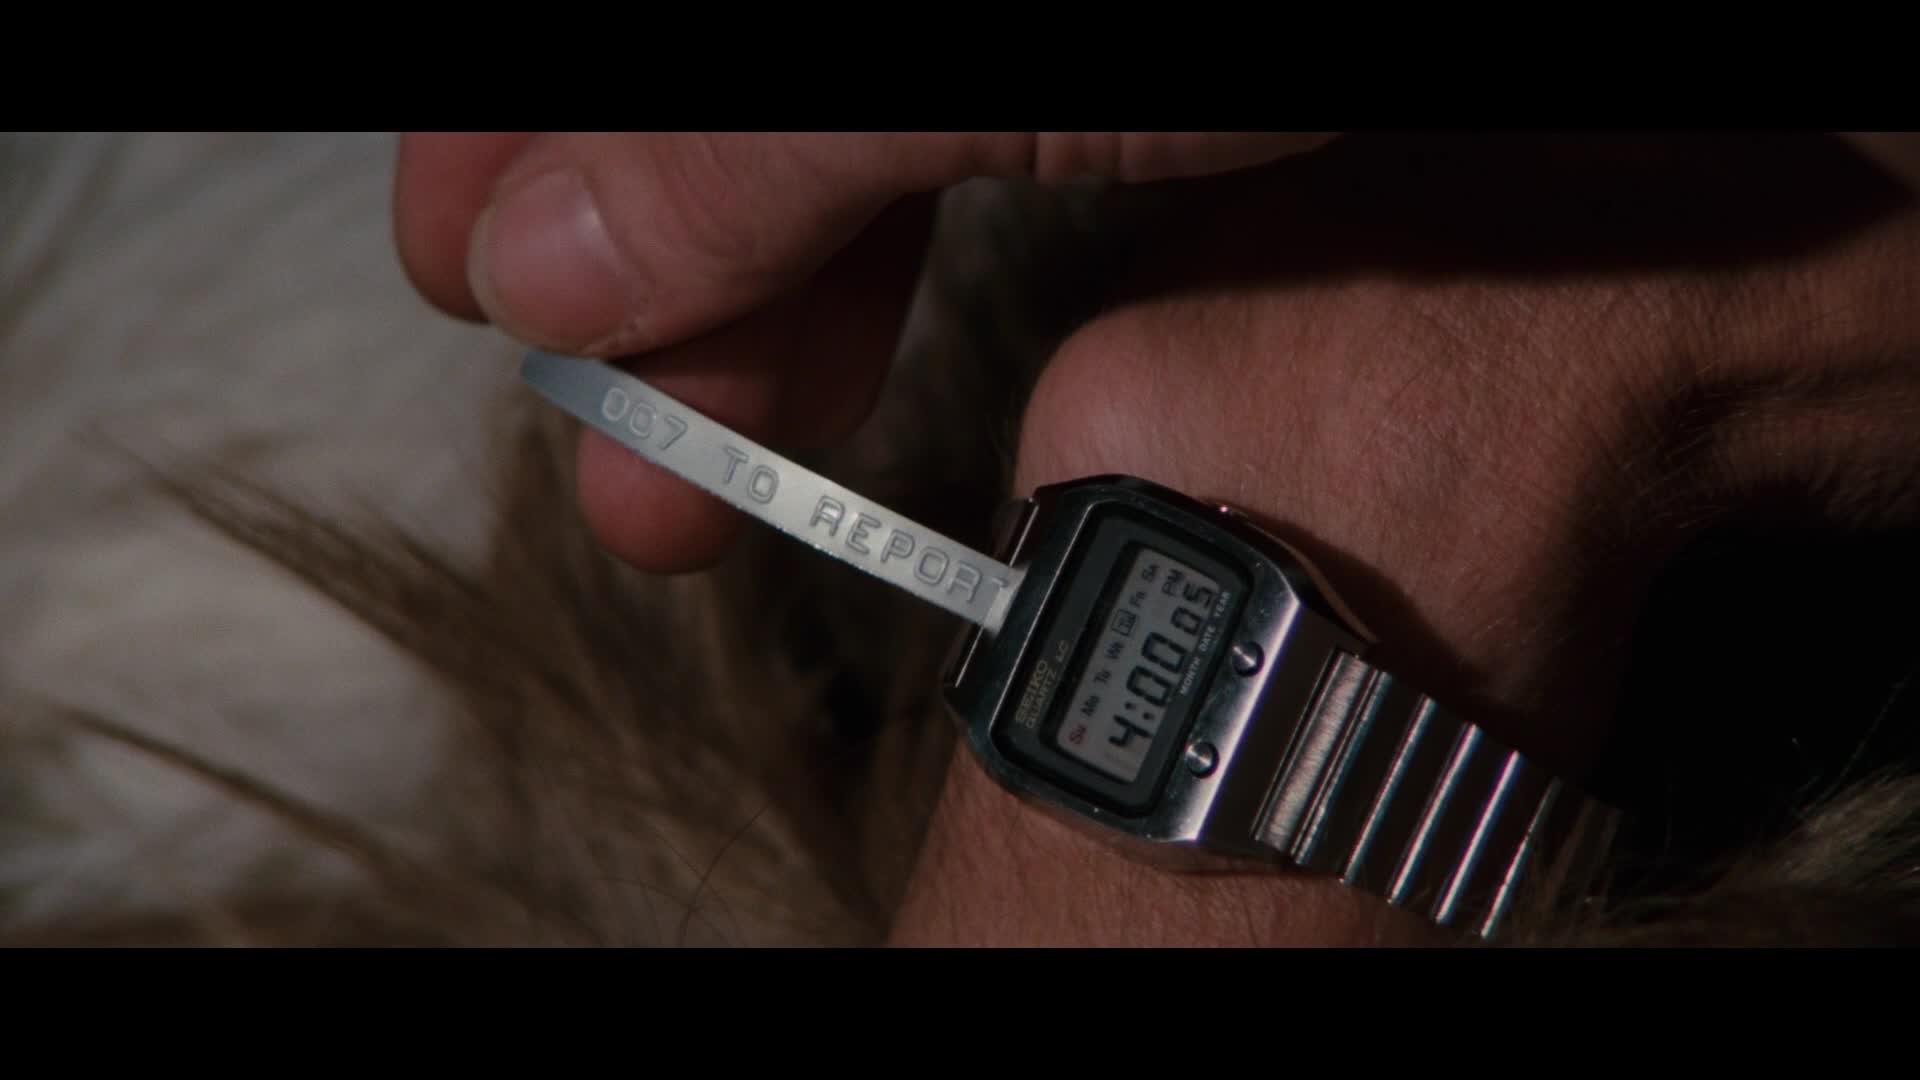 james-bond-watches-10.jpg